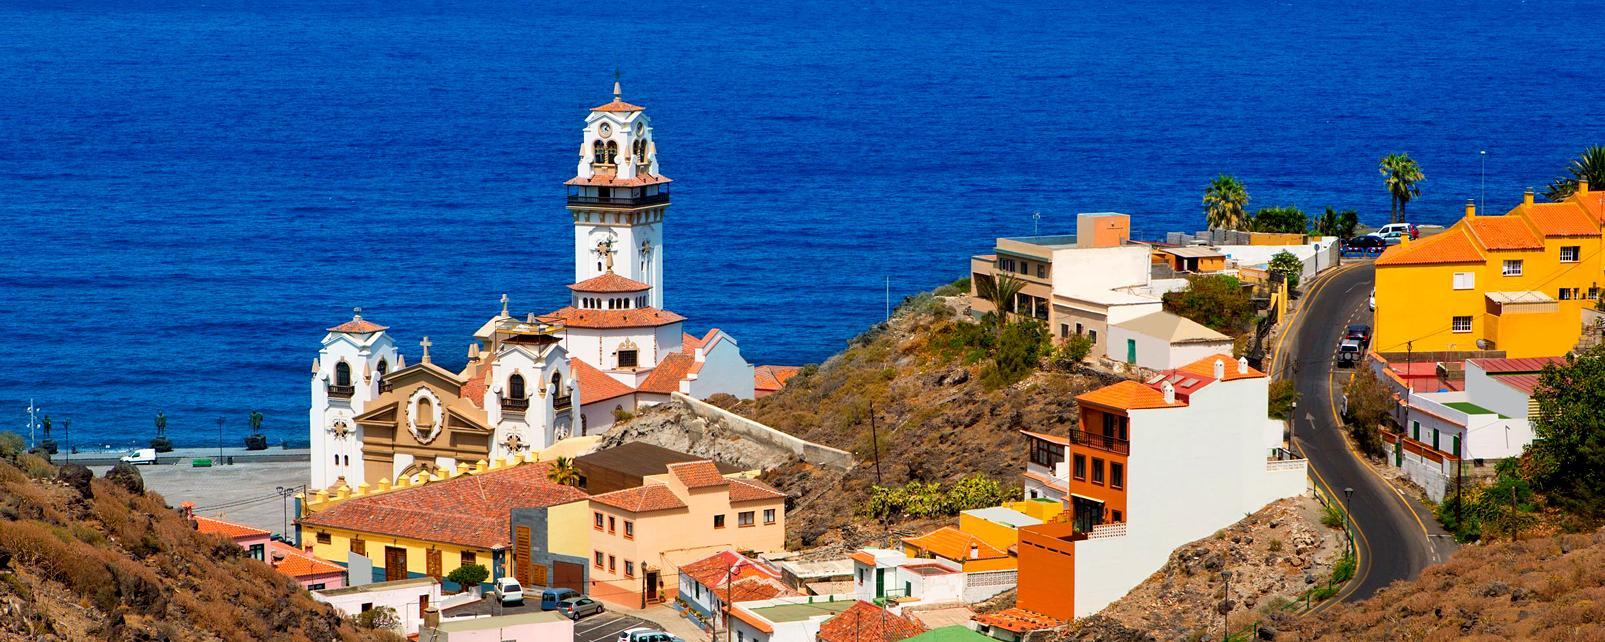 Canarias Tenerife